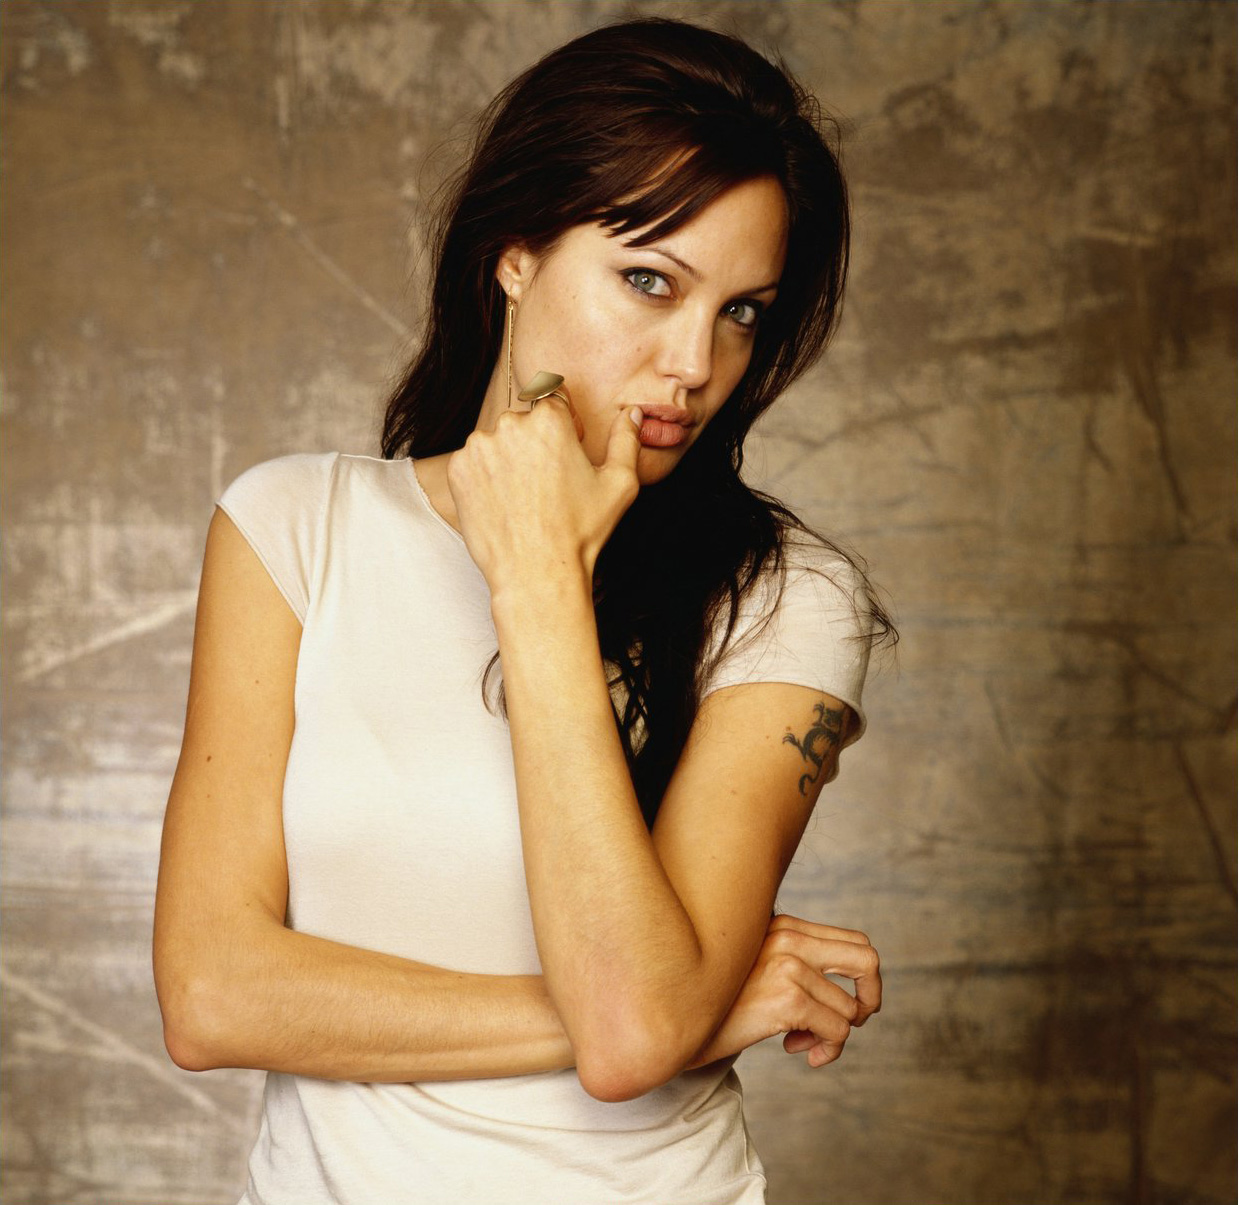 http://4.bp.blogspot.com/-BVSHMUyd3N4/TxmLsLhvb-I/AAAAAAAABbk/dhTkwLGKDaQ/s1600/Angelina-Jolie-Wallpapers.jpg